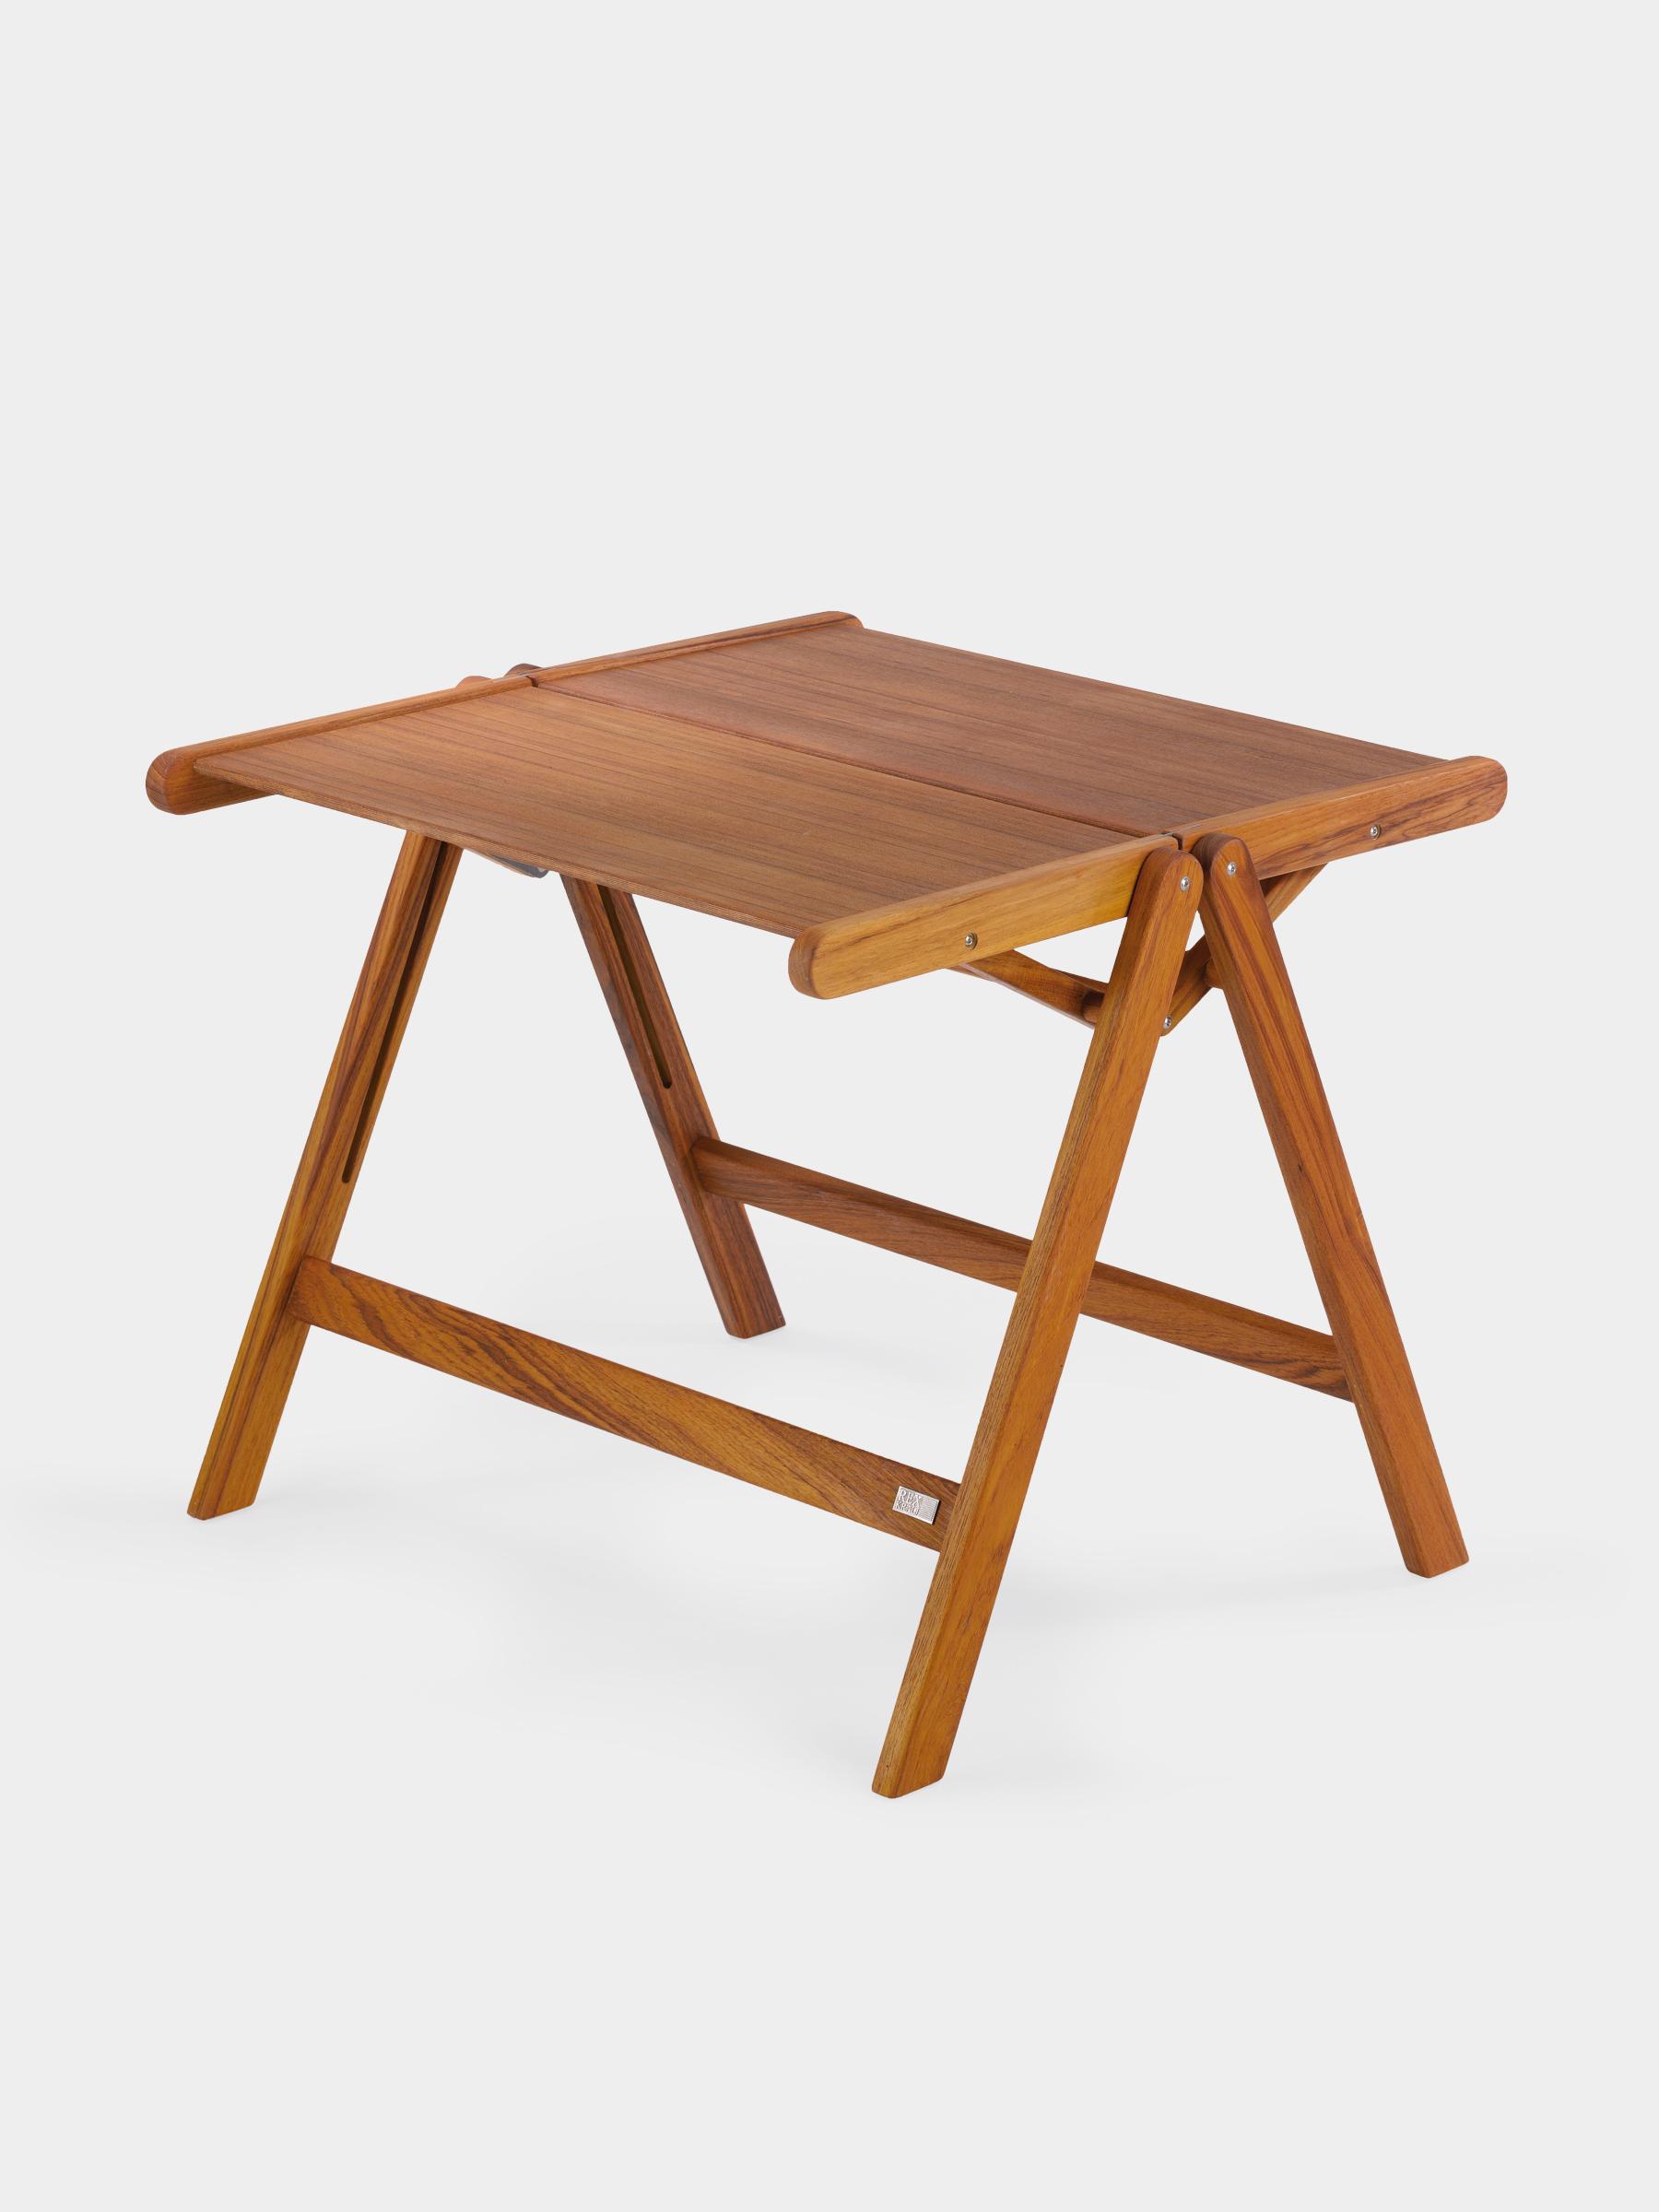 Rex_Kralj_coffee_table_teak